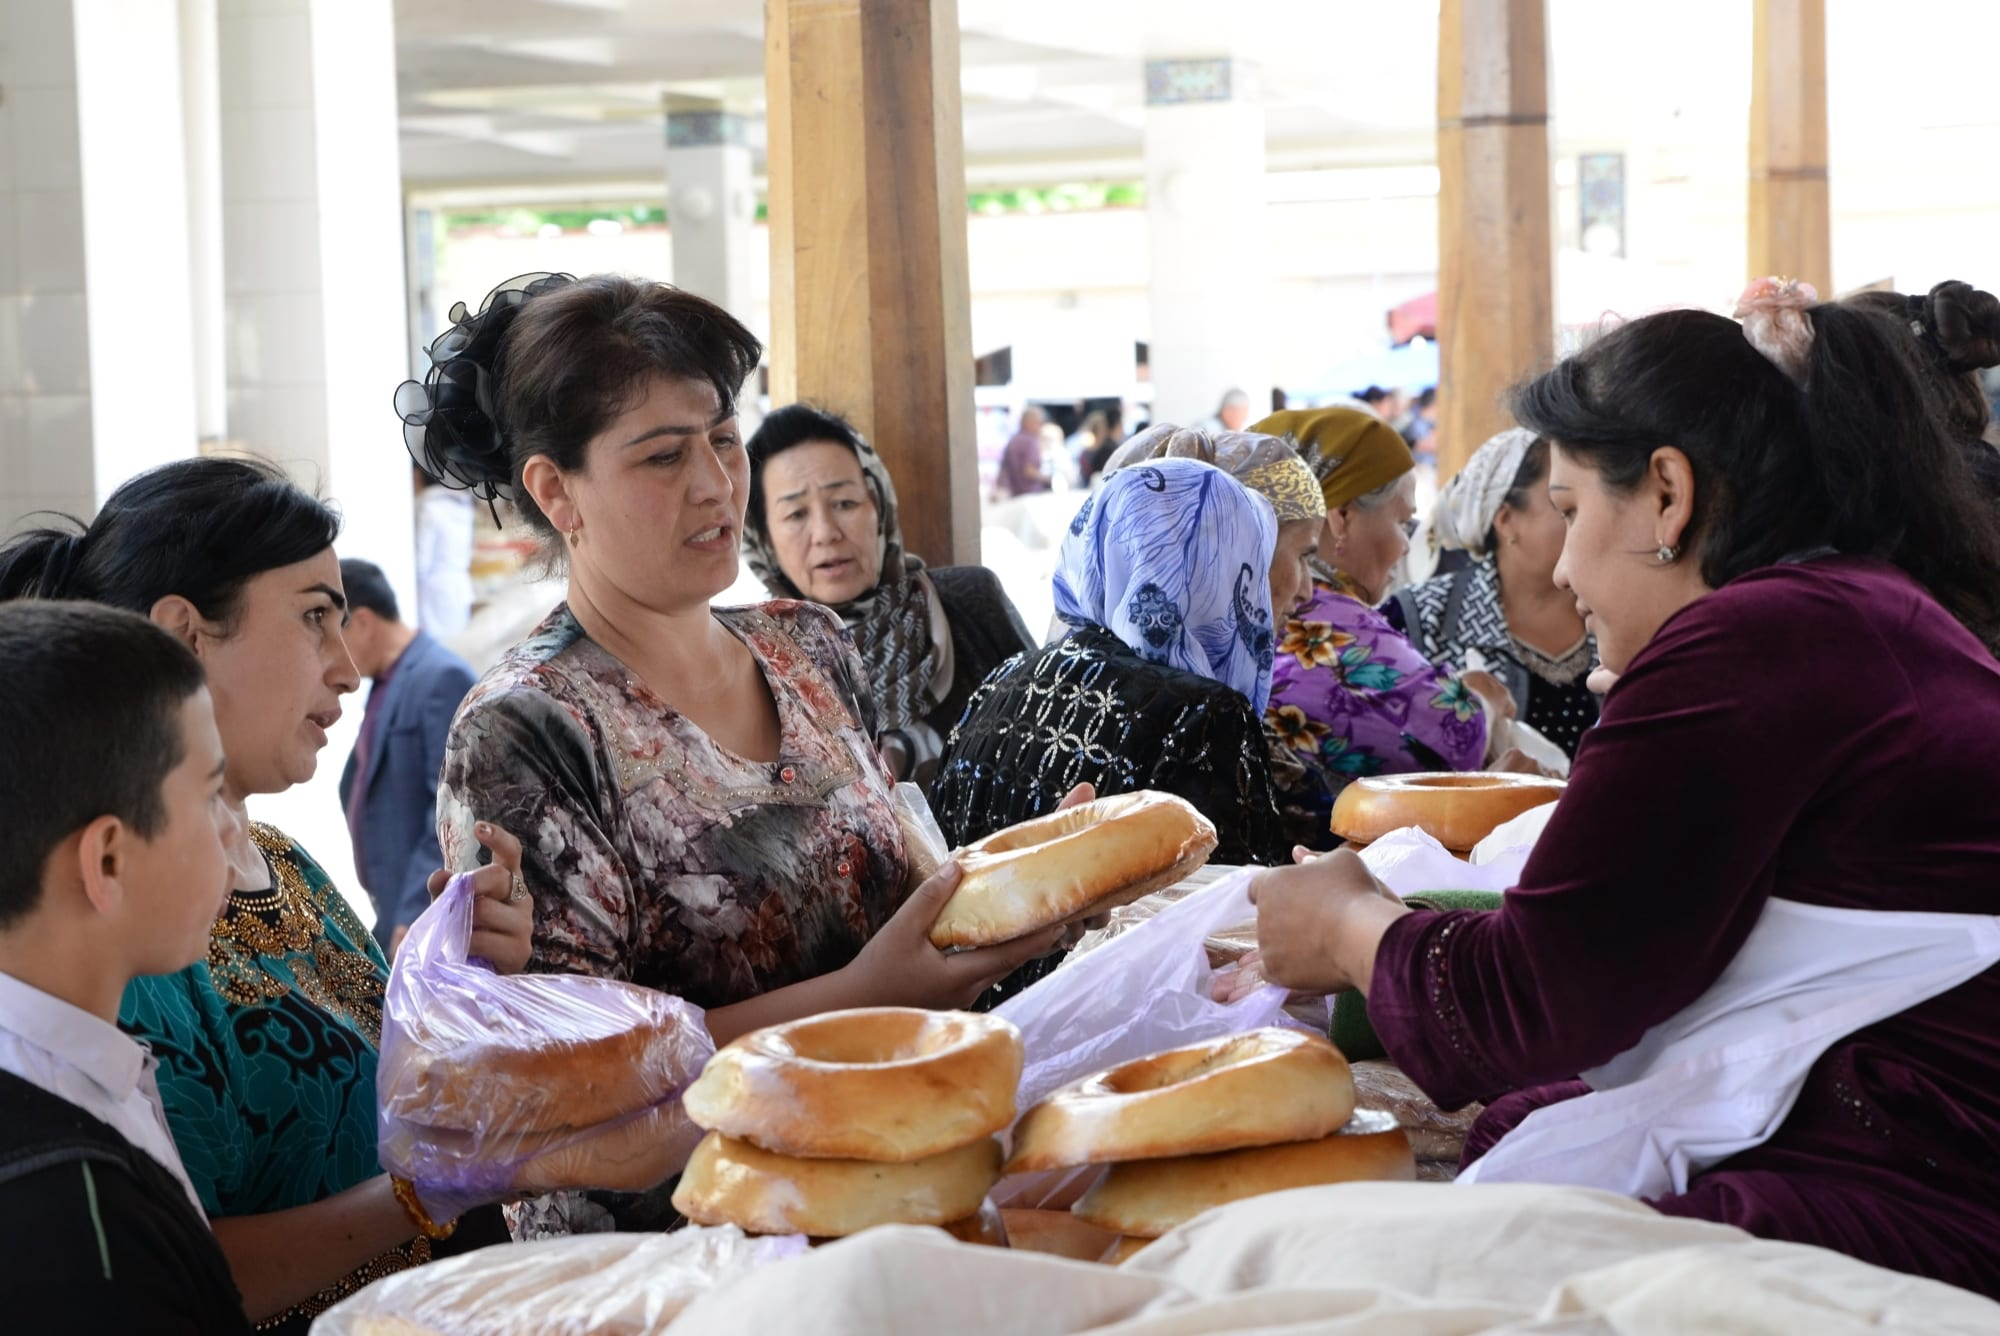 Samarkand, Uzbekistan: Sampling and buying Samarkand Non bread at the bazaar